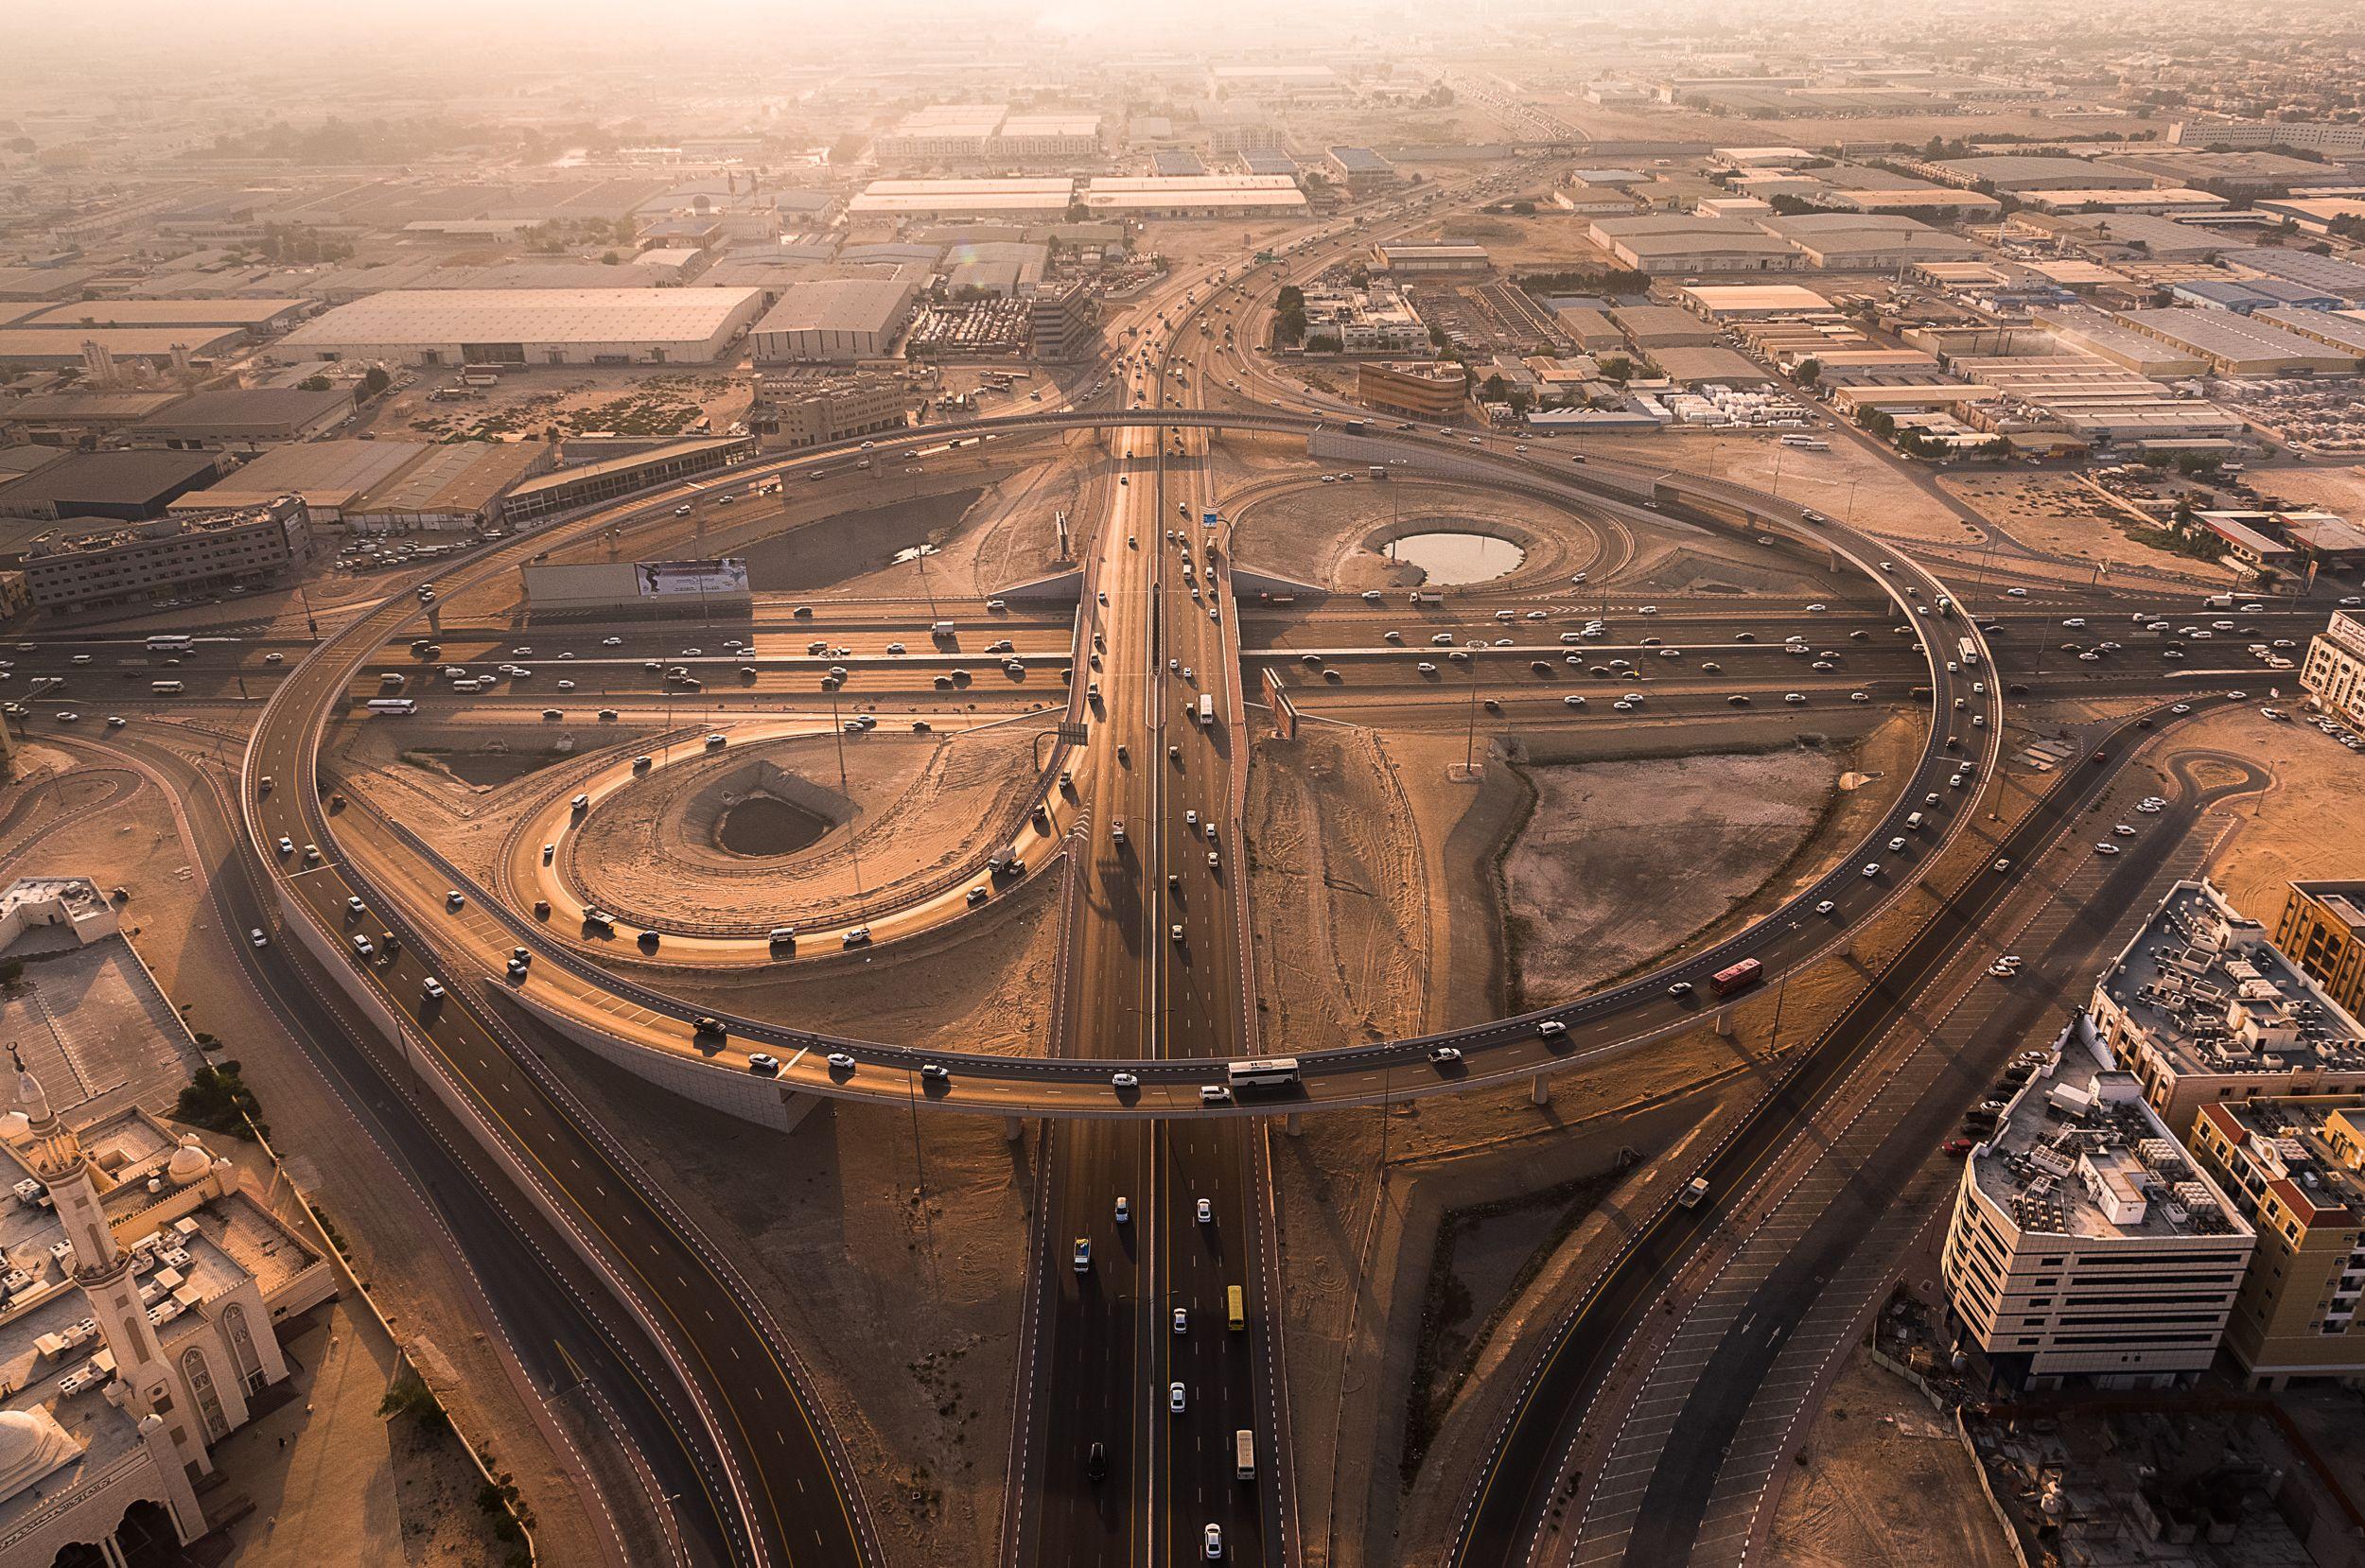 Dubai Drone Rental Abu Dhabi Drone Rental-05_DJI_0151-2-Edit.jpg